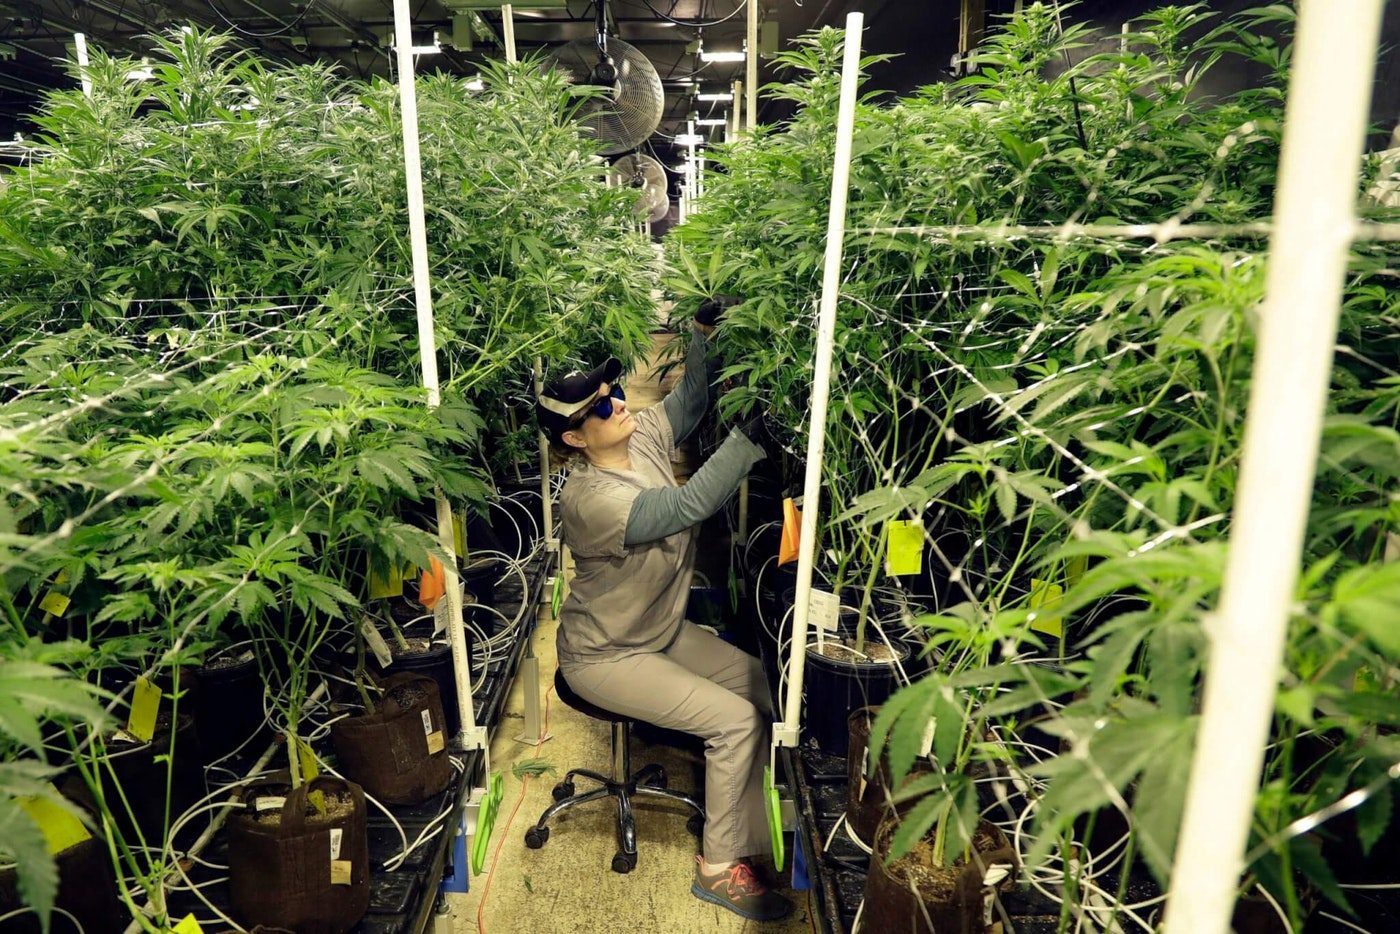 An employee at a medical marijuana dispensary, trims leaves off marijuana plants in the company's grow house. (AP Photo/Julio Cortez, File)